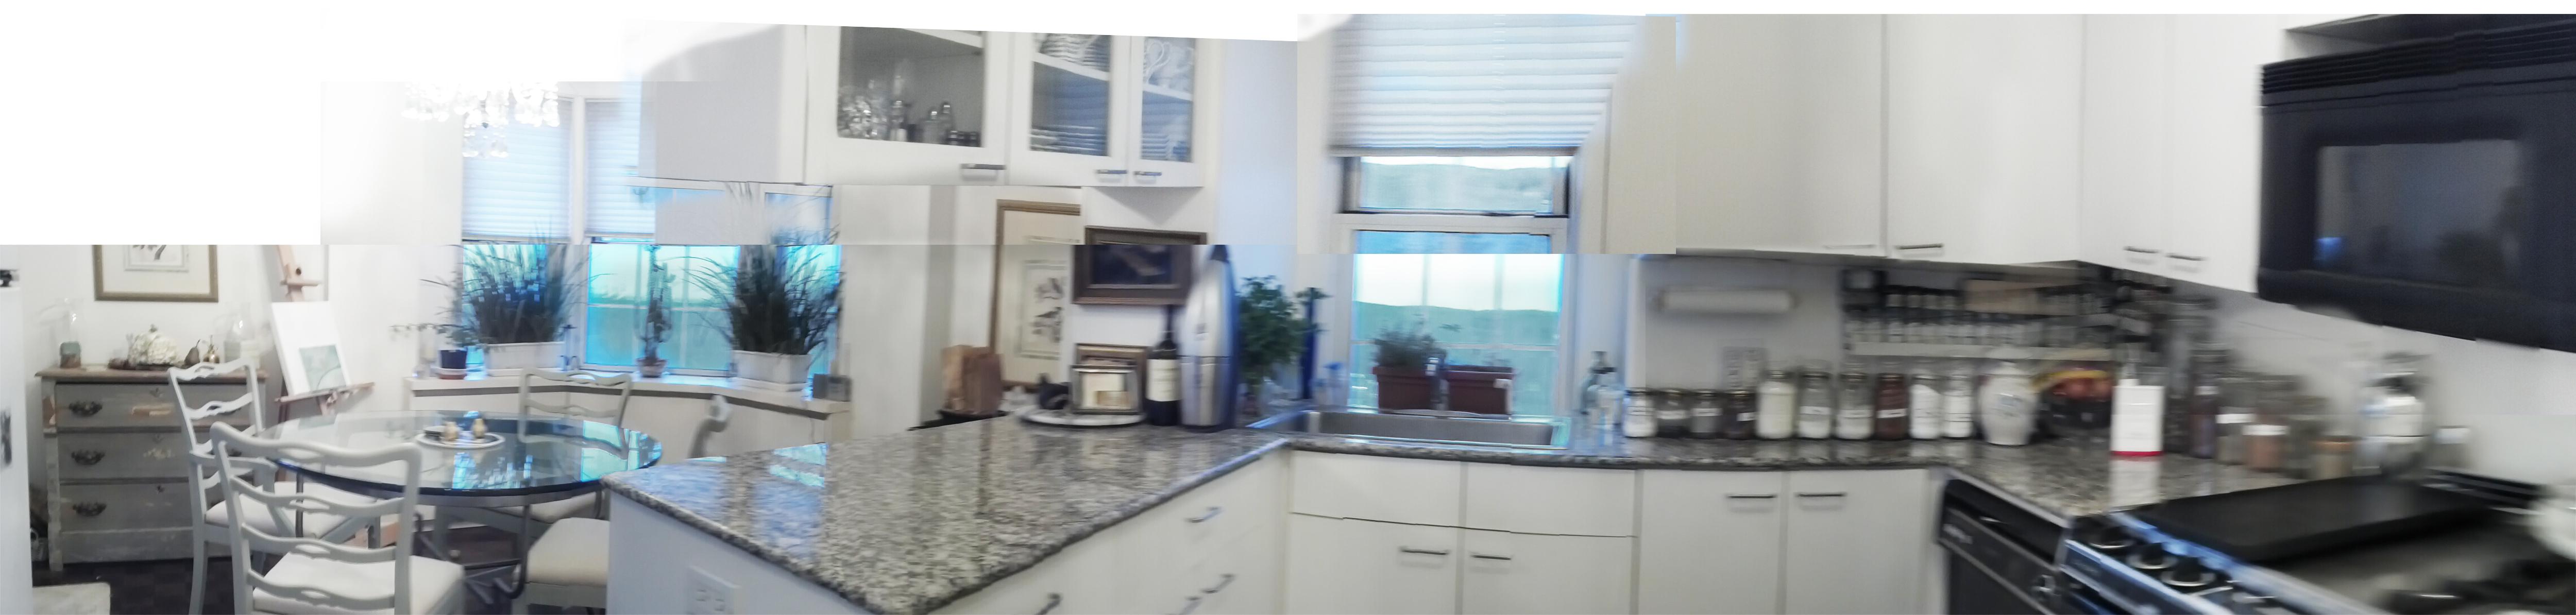 Dorable Mouse Kitchen Inspiration - Kitchen Cabinets | Ideas ...